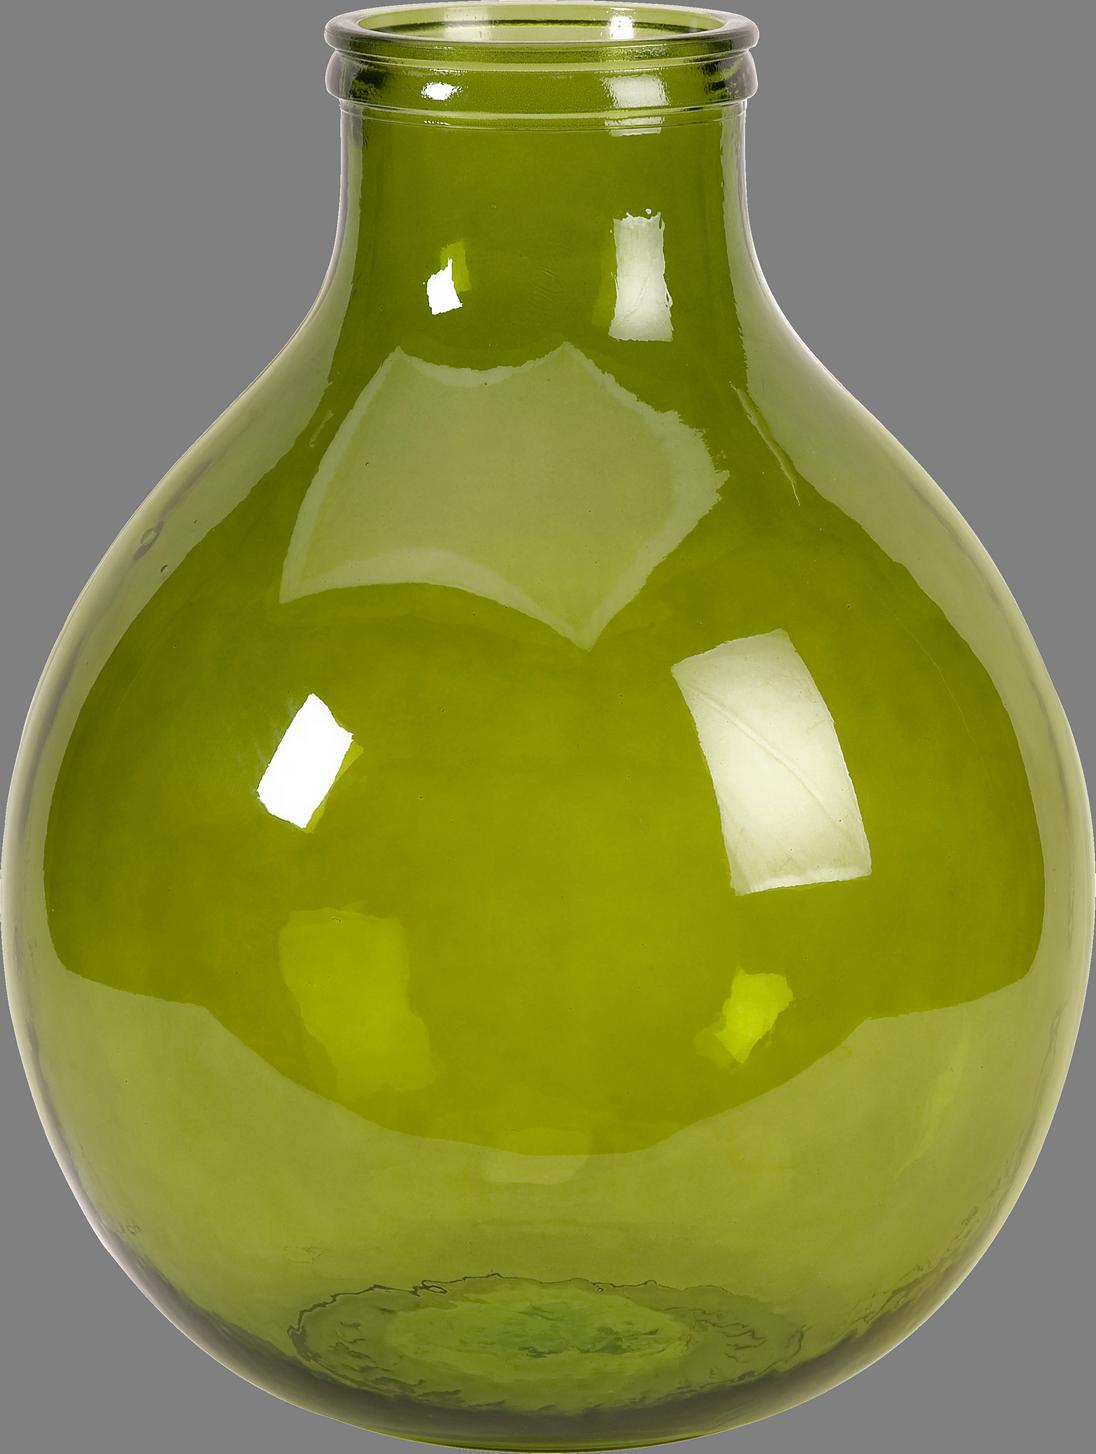 Vase PNG Image - PurePNG   Free transparent CC0 PNG Image ...